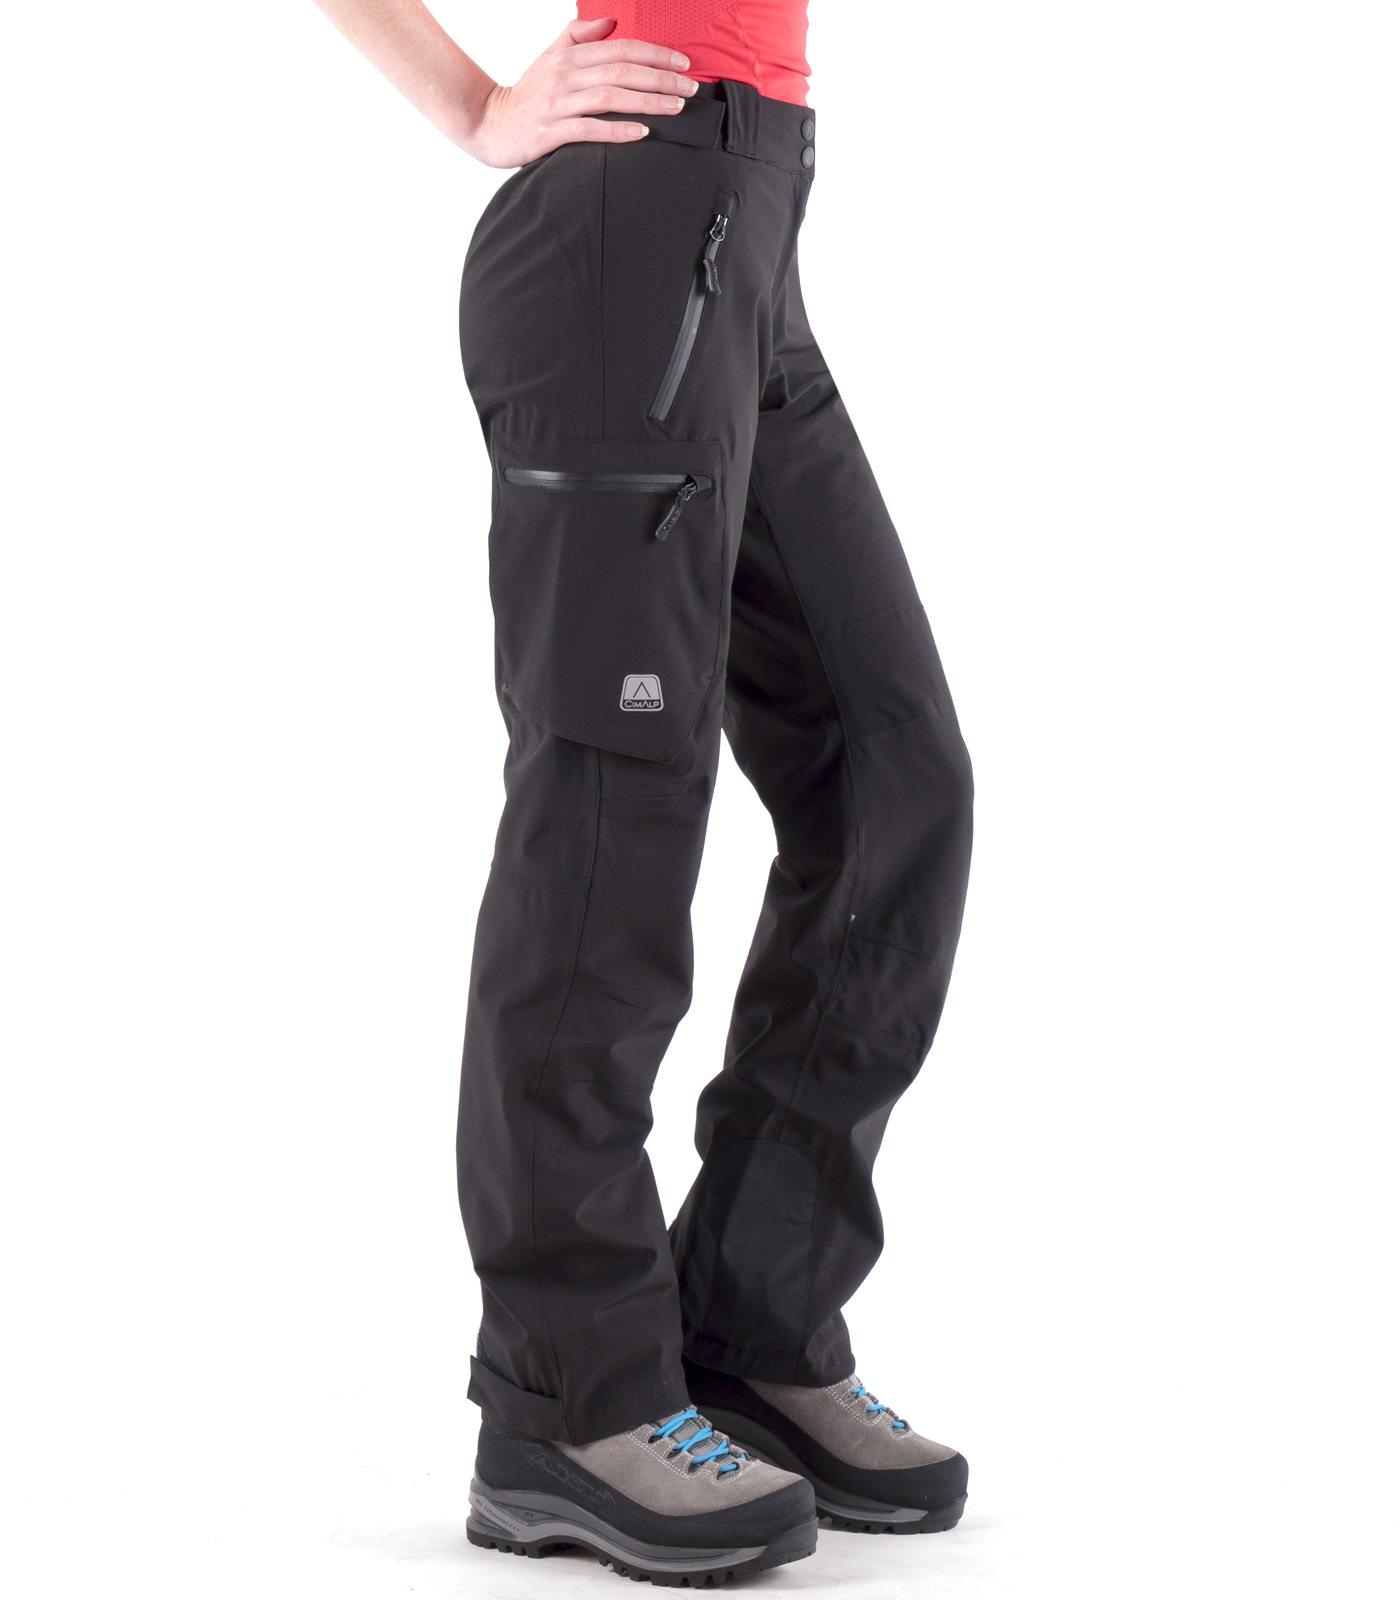 pantalon randonnée imperméable